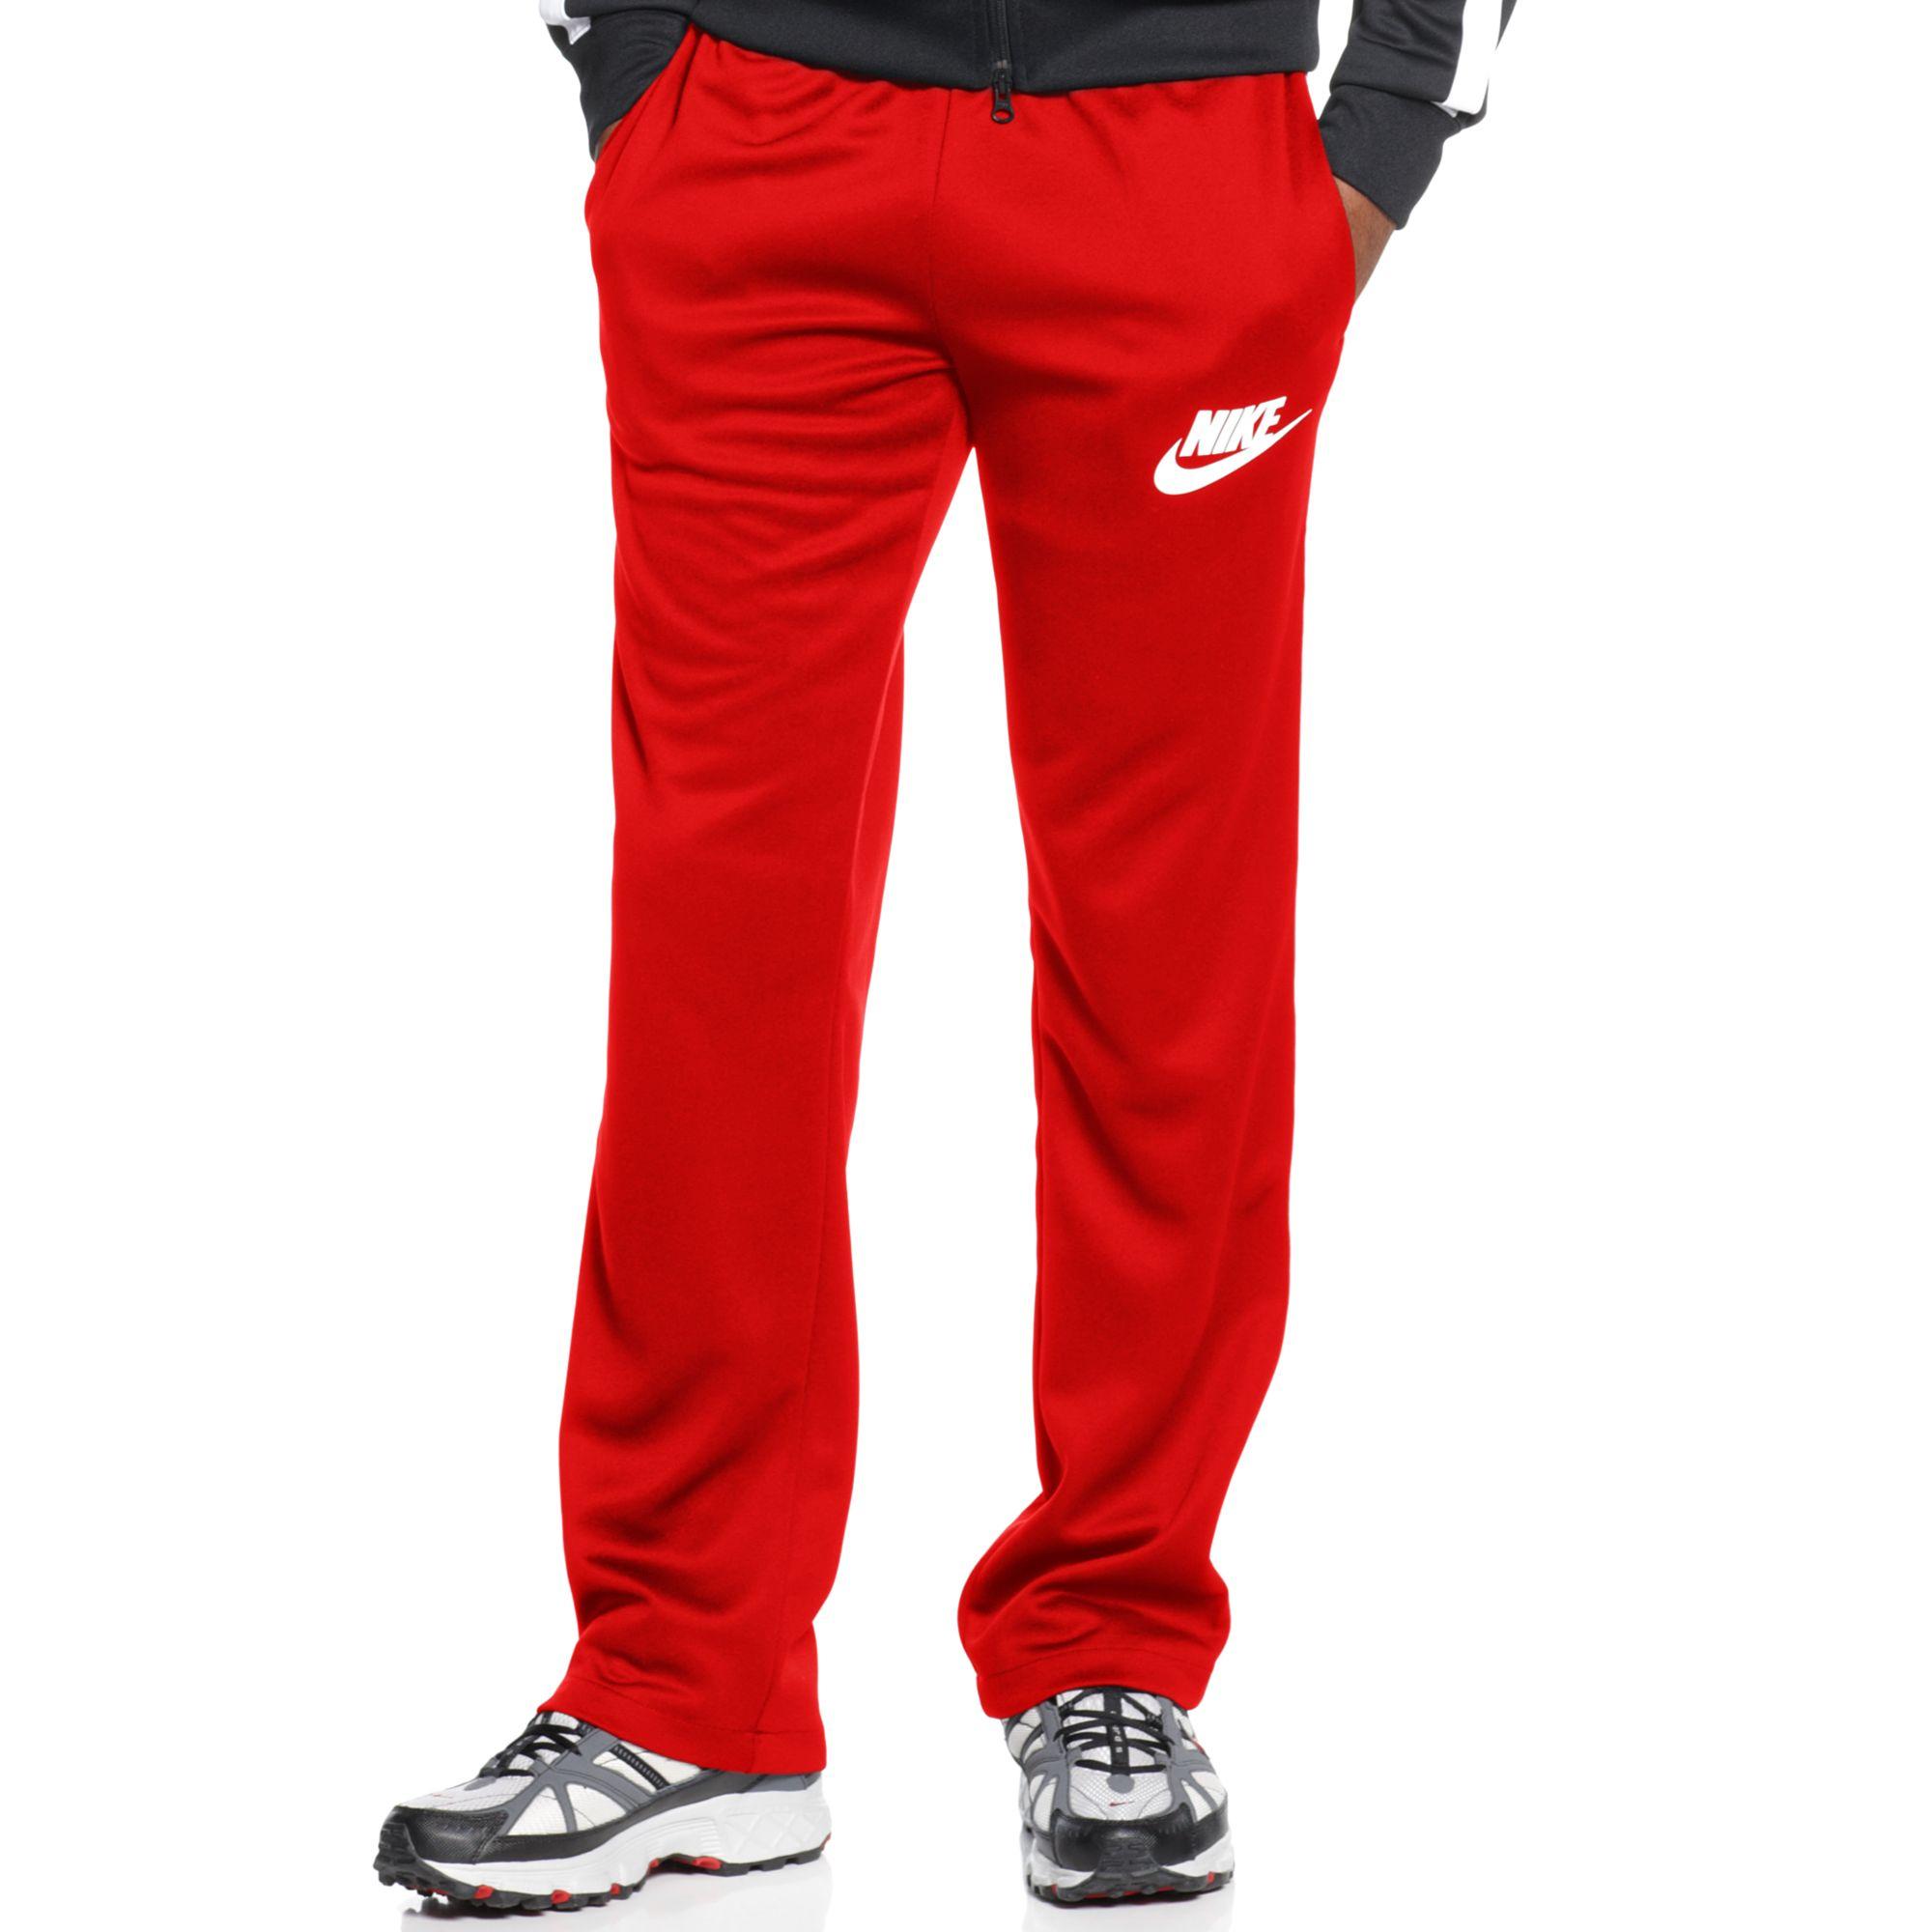 Logo Pants Lyst For Red Men In Nike Track 5PfwTq